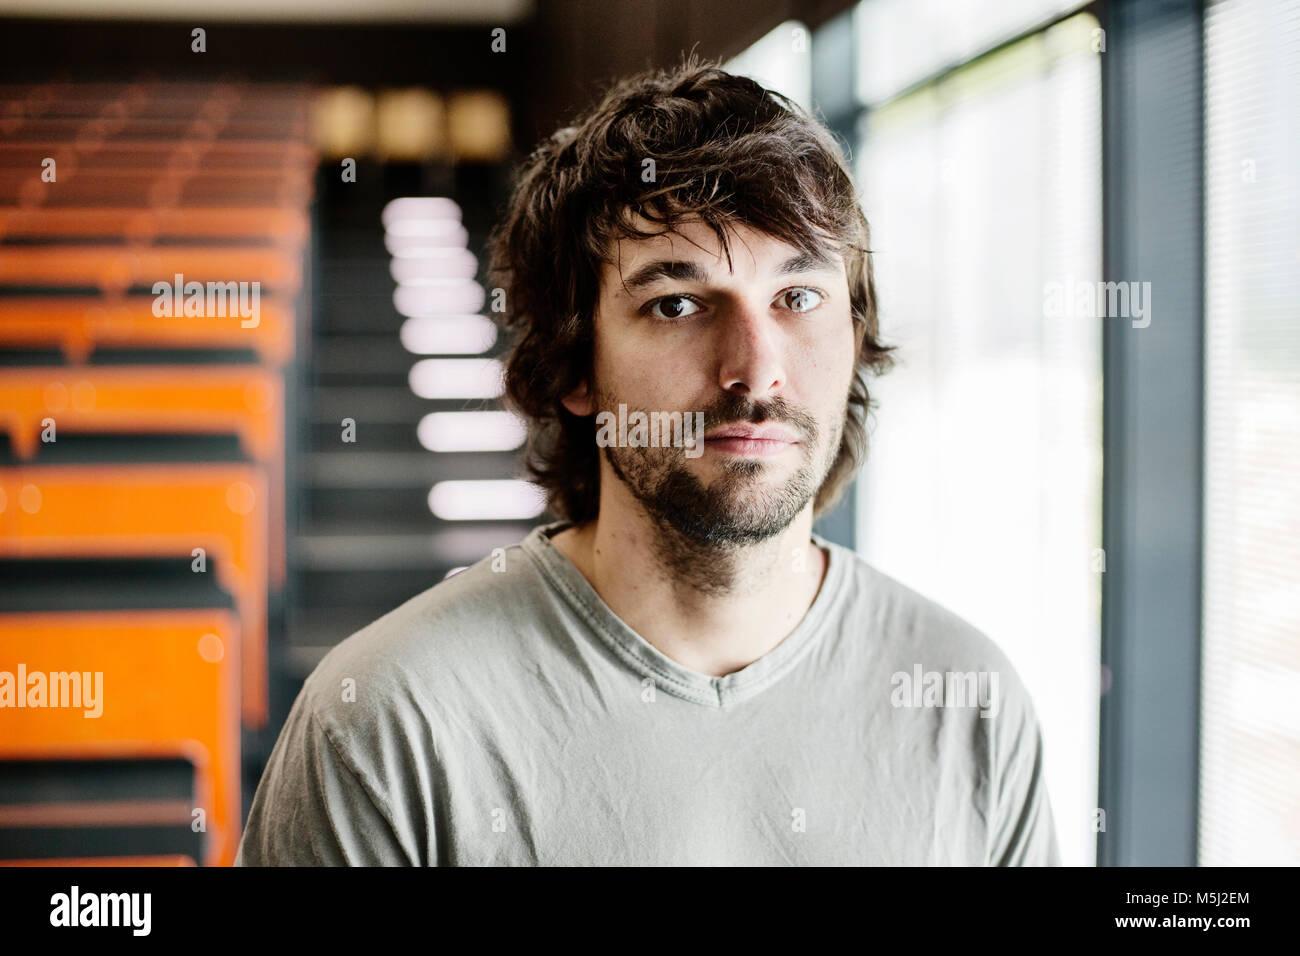 junger Mann, Student, im Hörsaal einer Universität,  Aachen - Stock Image